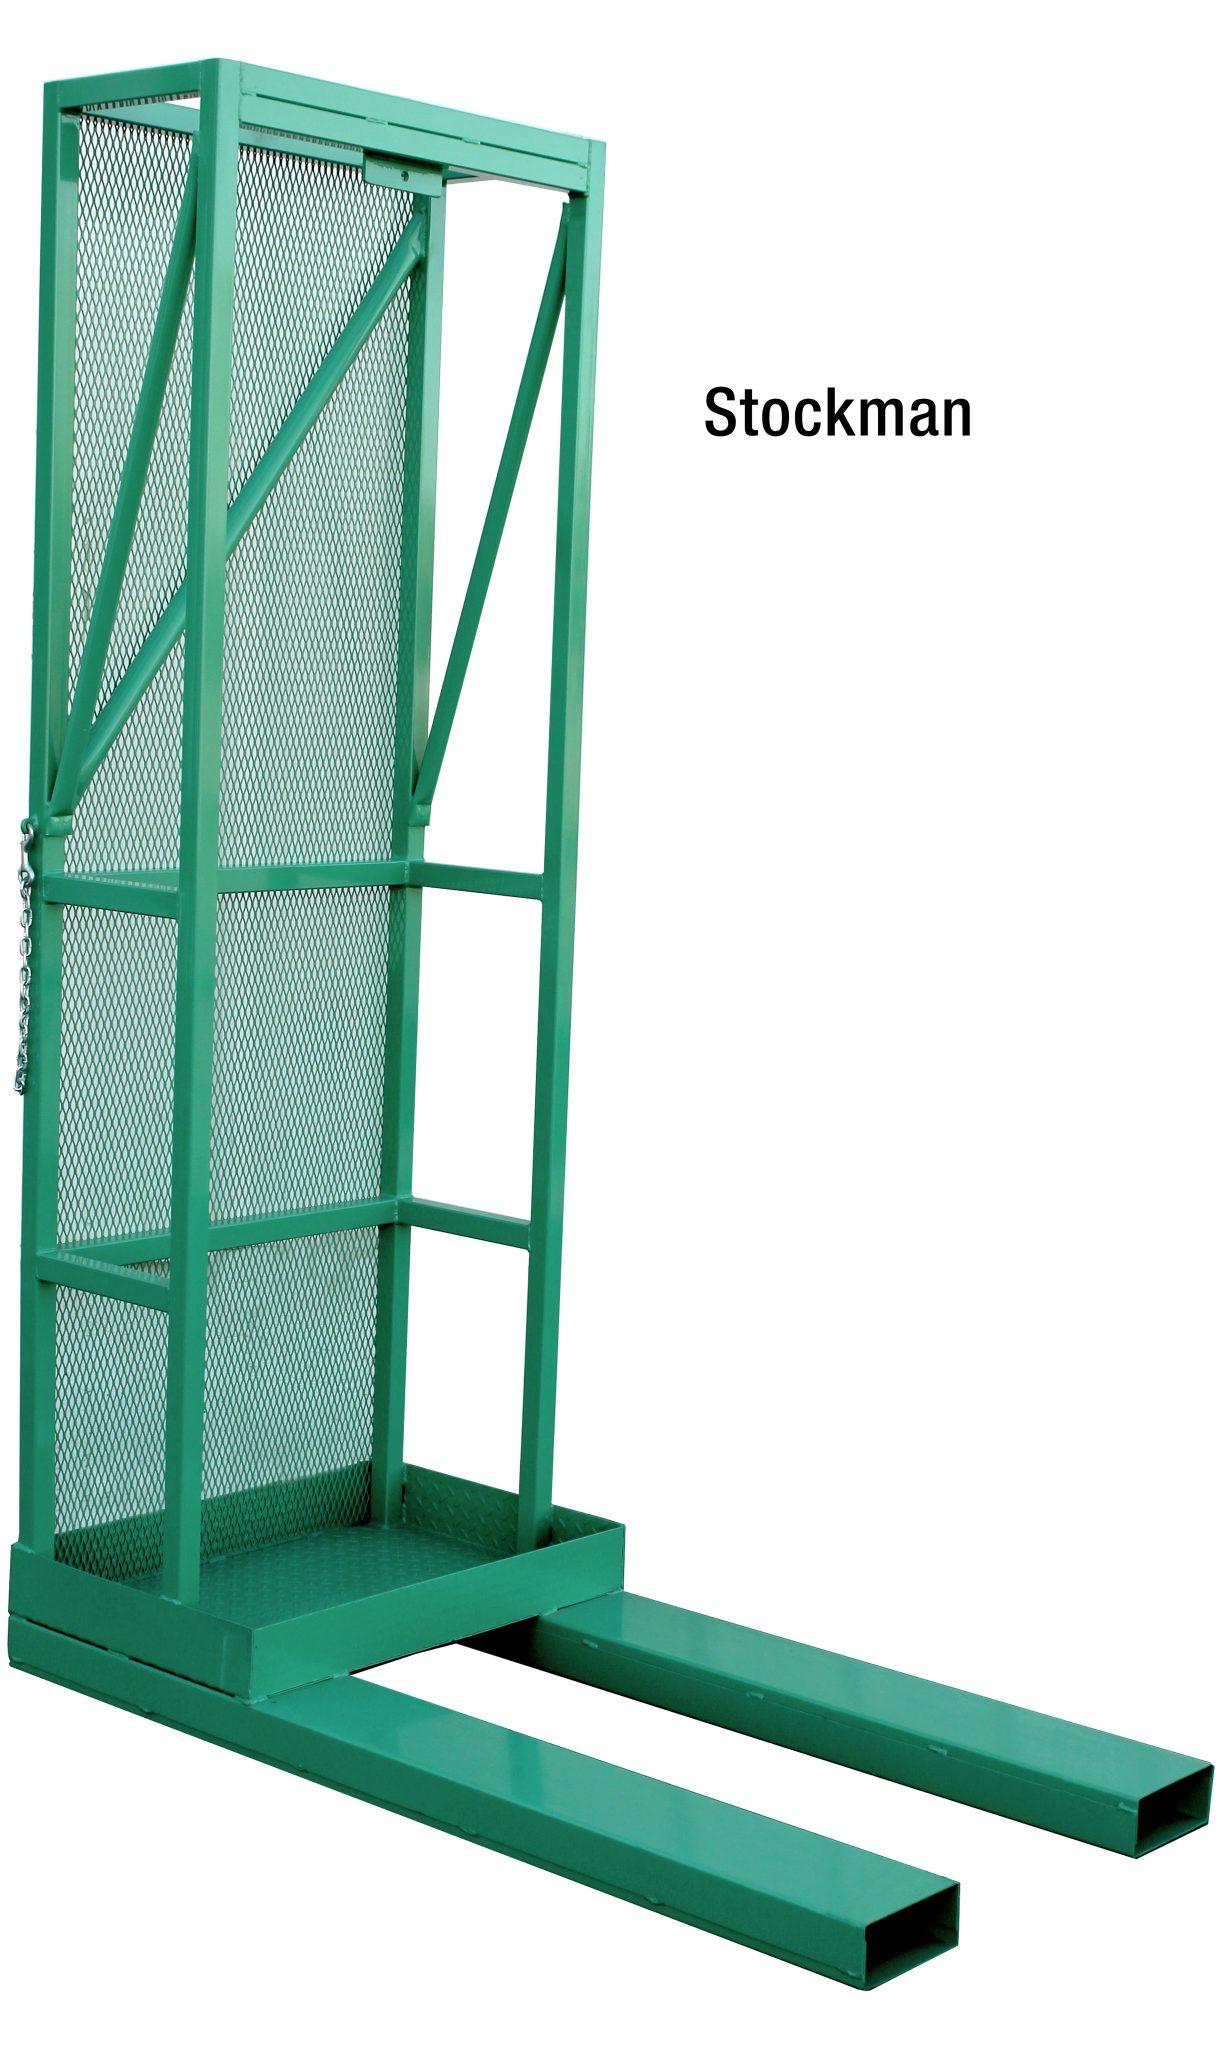 wildeck-stockman(2)